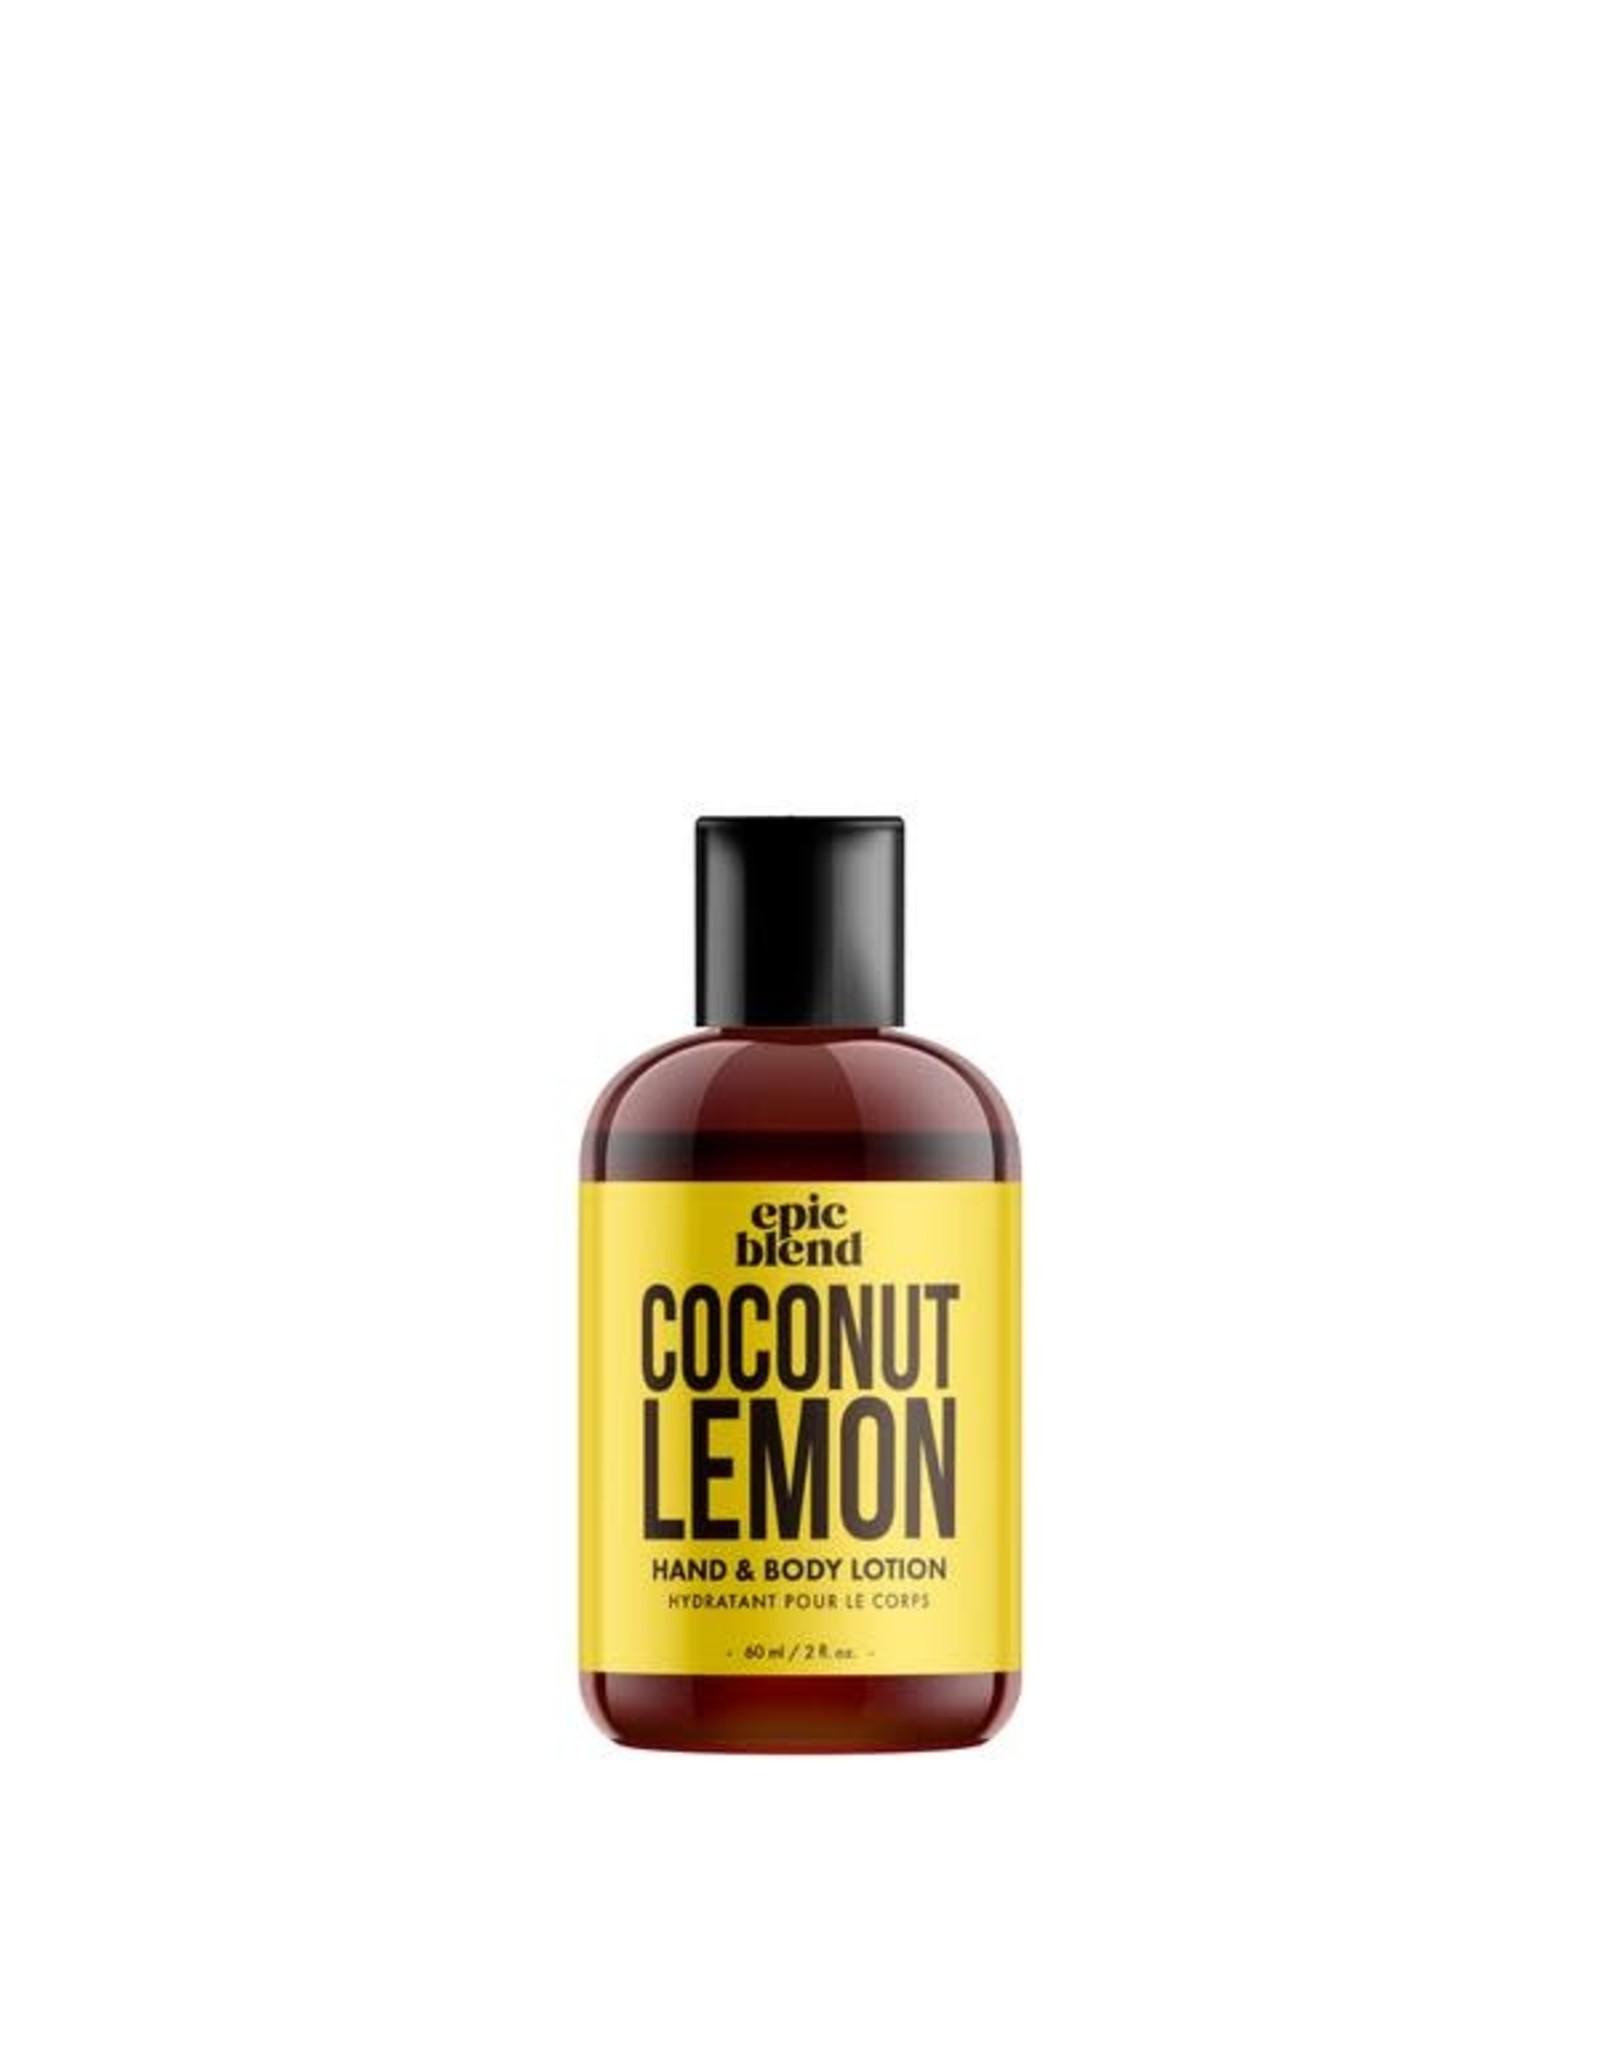 Epic Blend Coconut Lemon Hand & Body Lotion